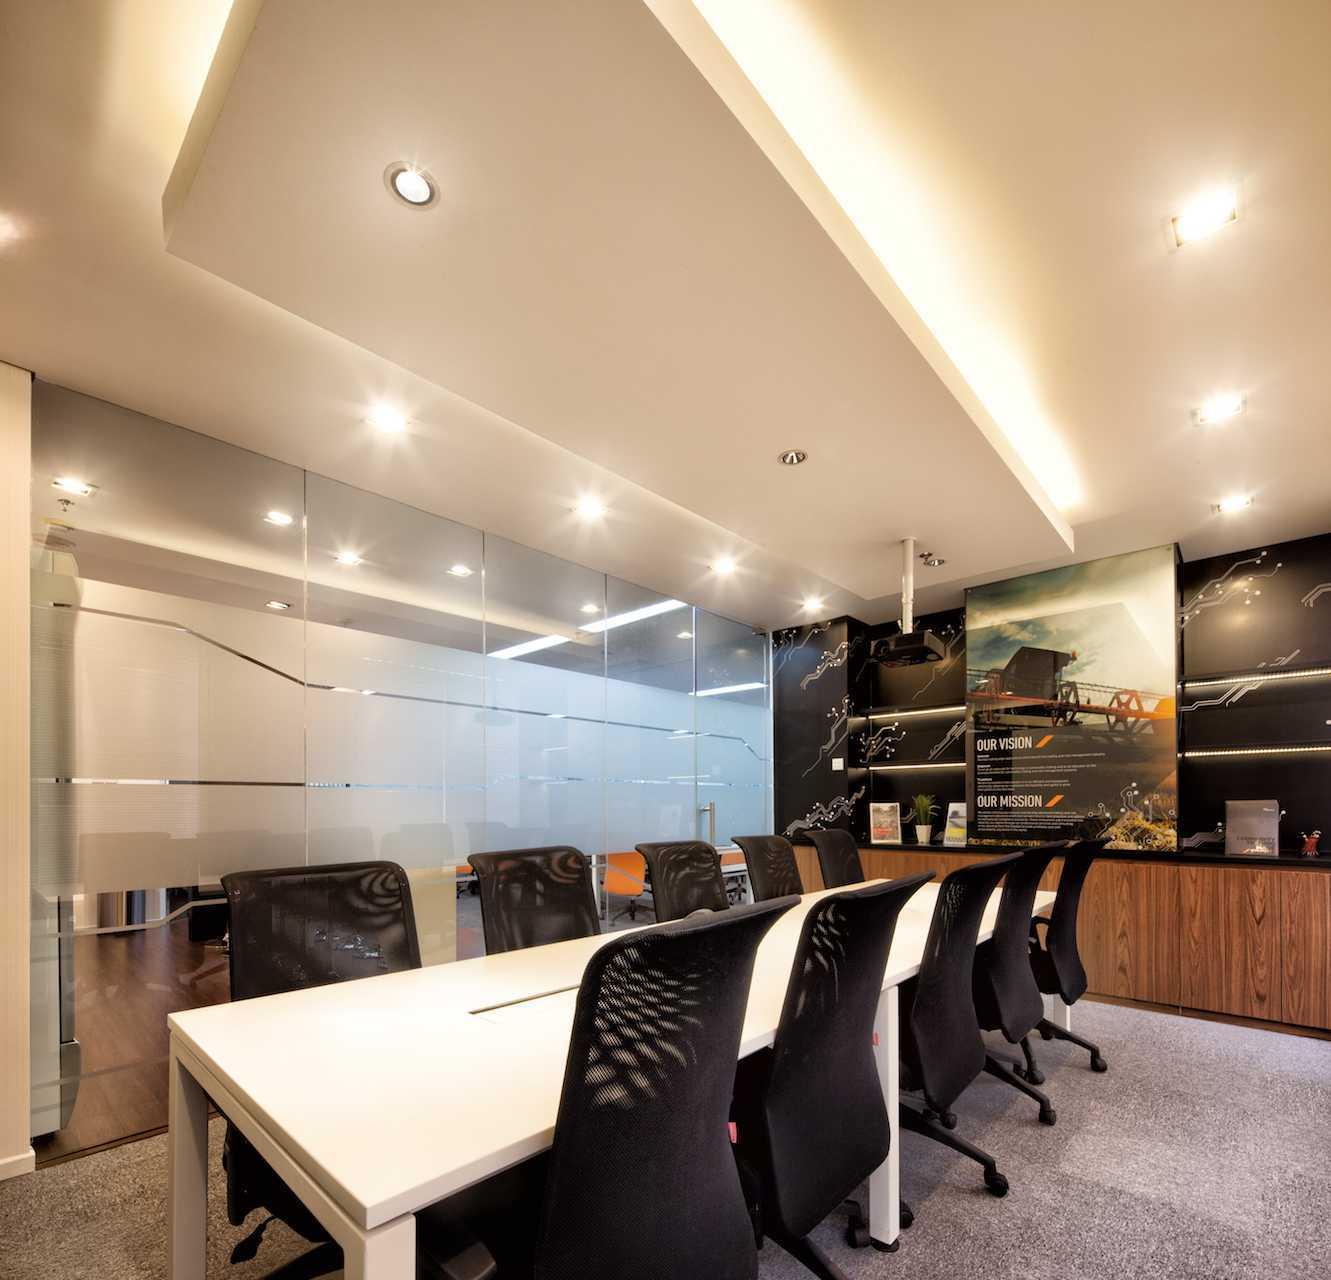 Pt Asa Adiguna Just Commodity Menara Thamrin Building Menara Thamrin Building Meeting Room  24525